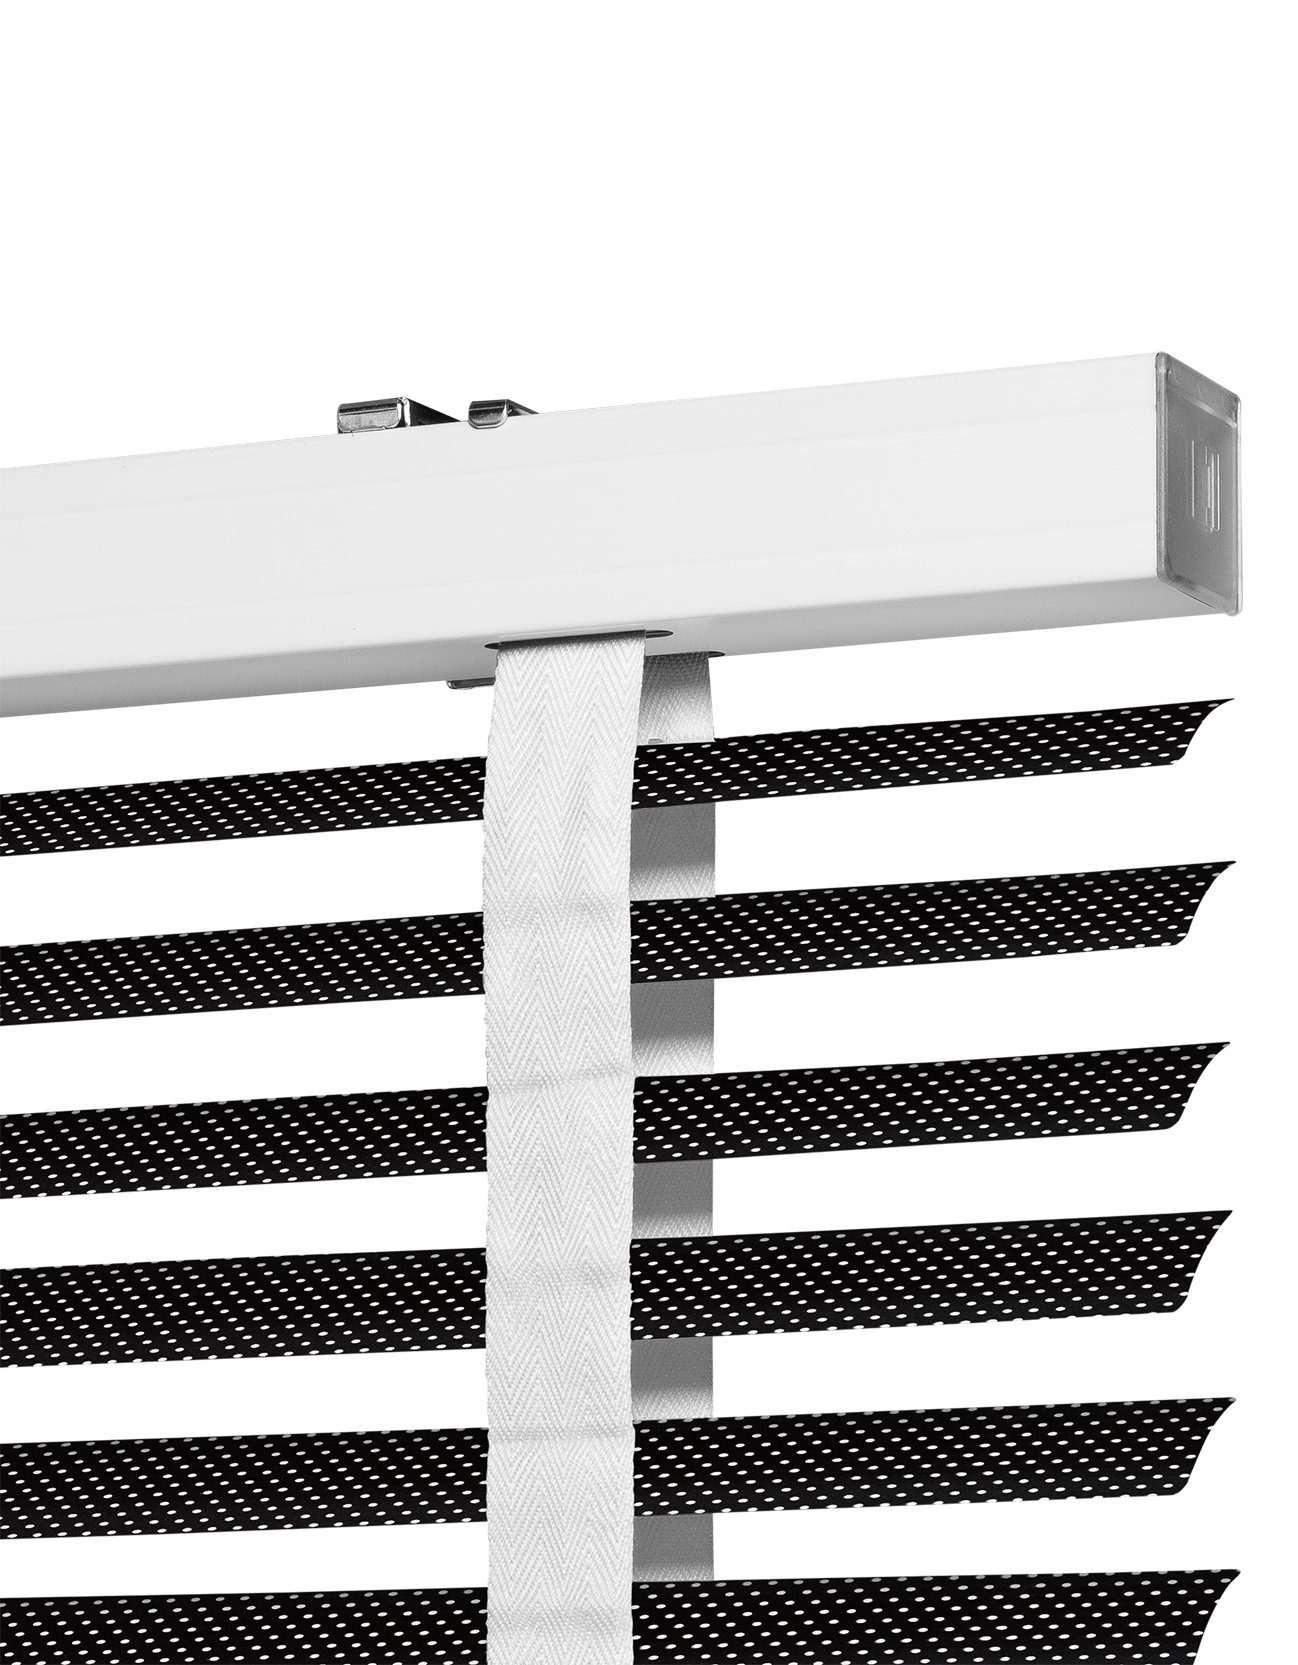 Houtskool Perforation Aluminium Jaloezie 50 mm Uitsnede